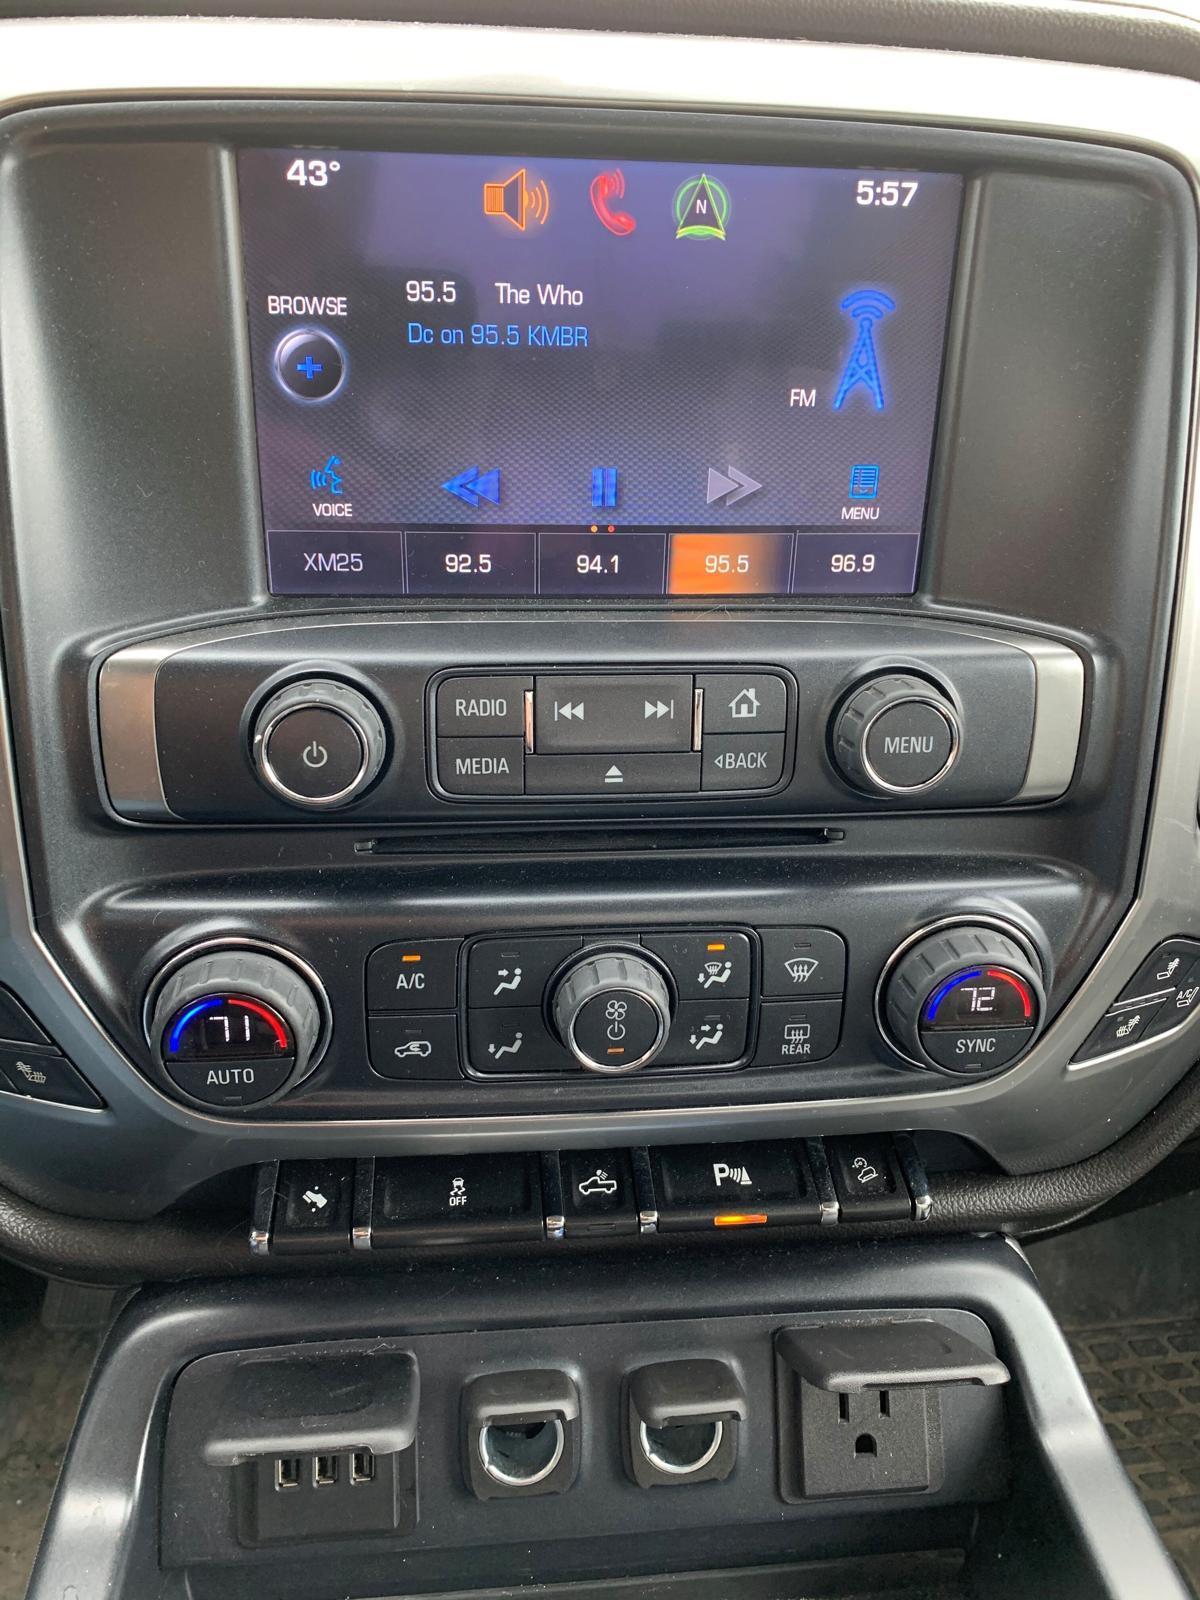 2014 Chevy Silverado 1500 LTZ, Z71, 4x4, Crew Cab image 1